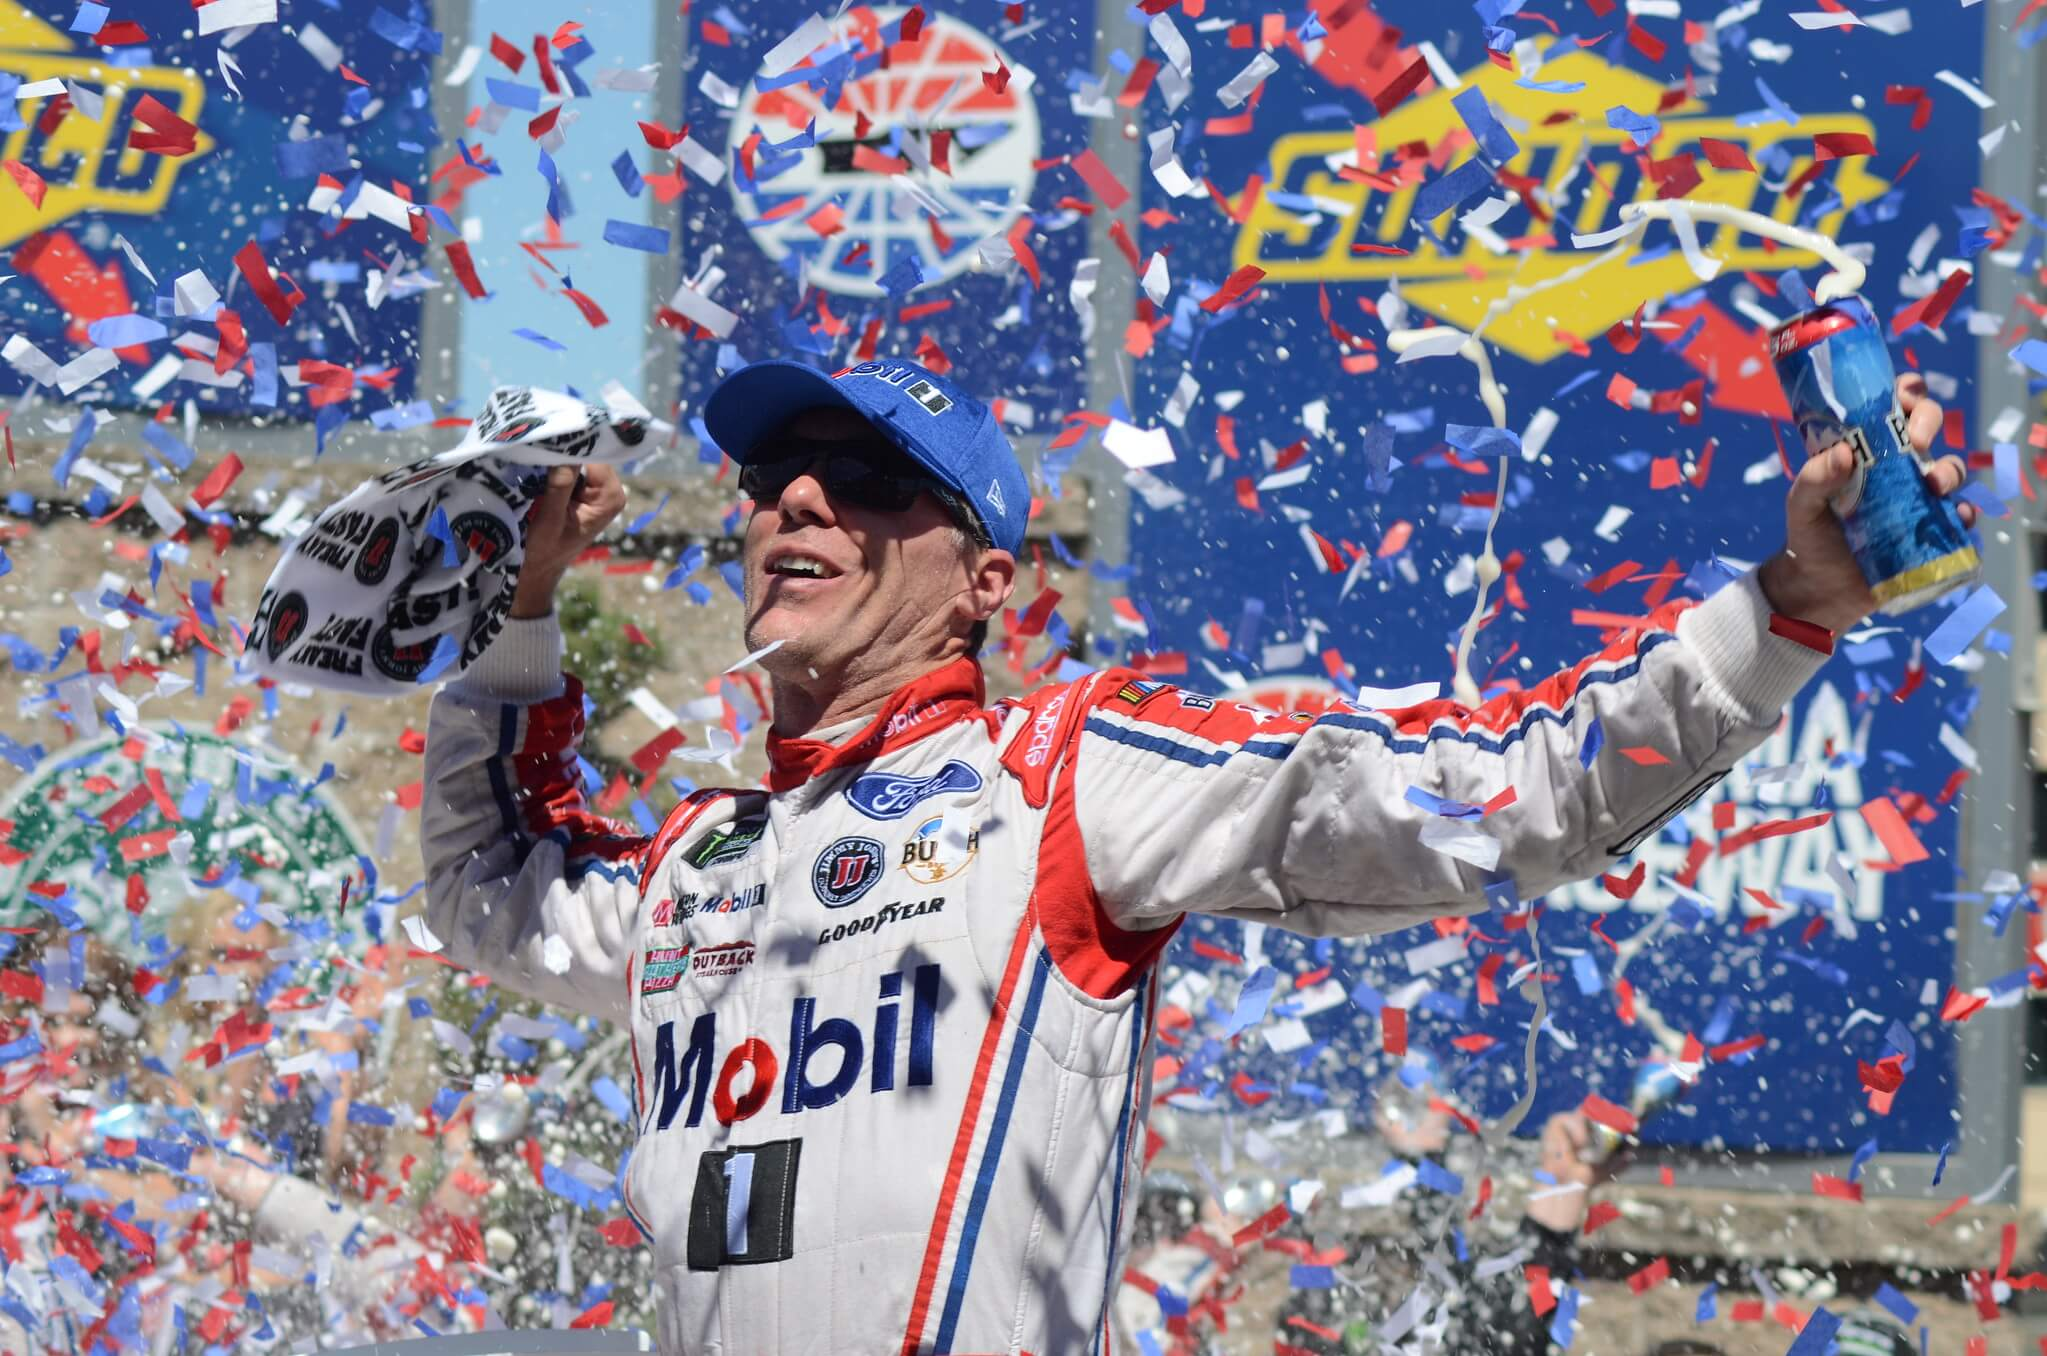 Kevin Harvick NASCAR driver